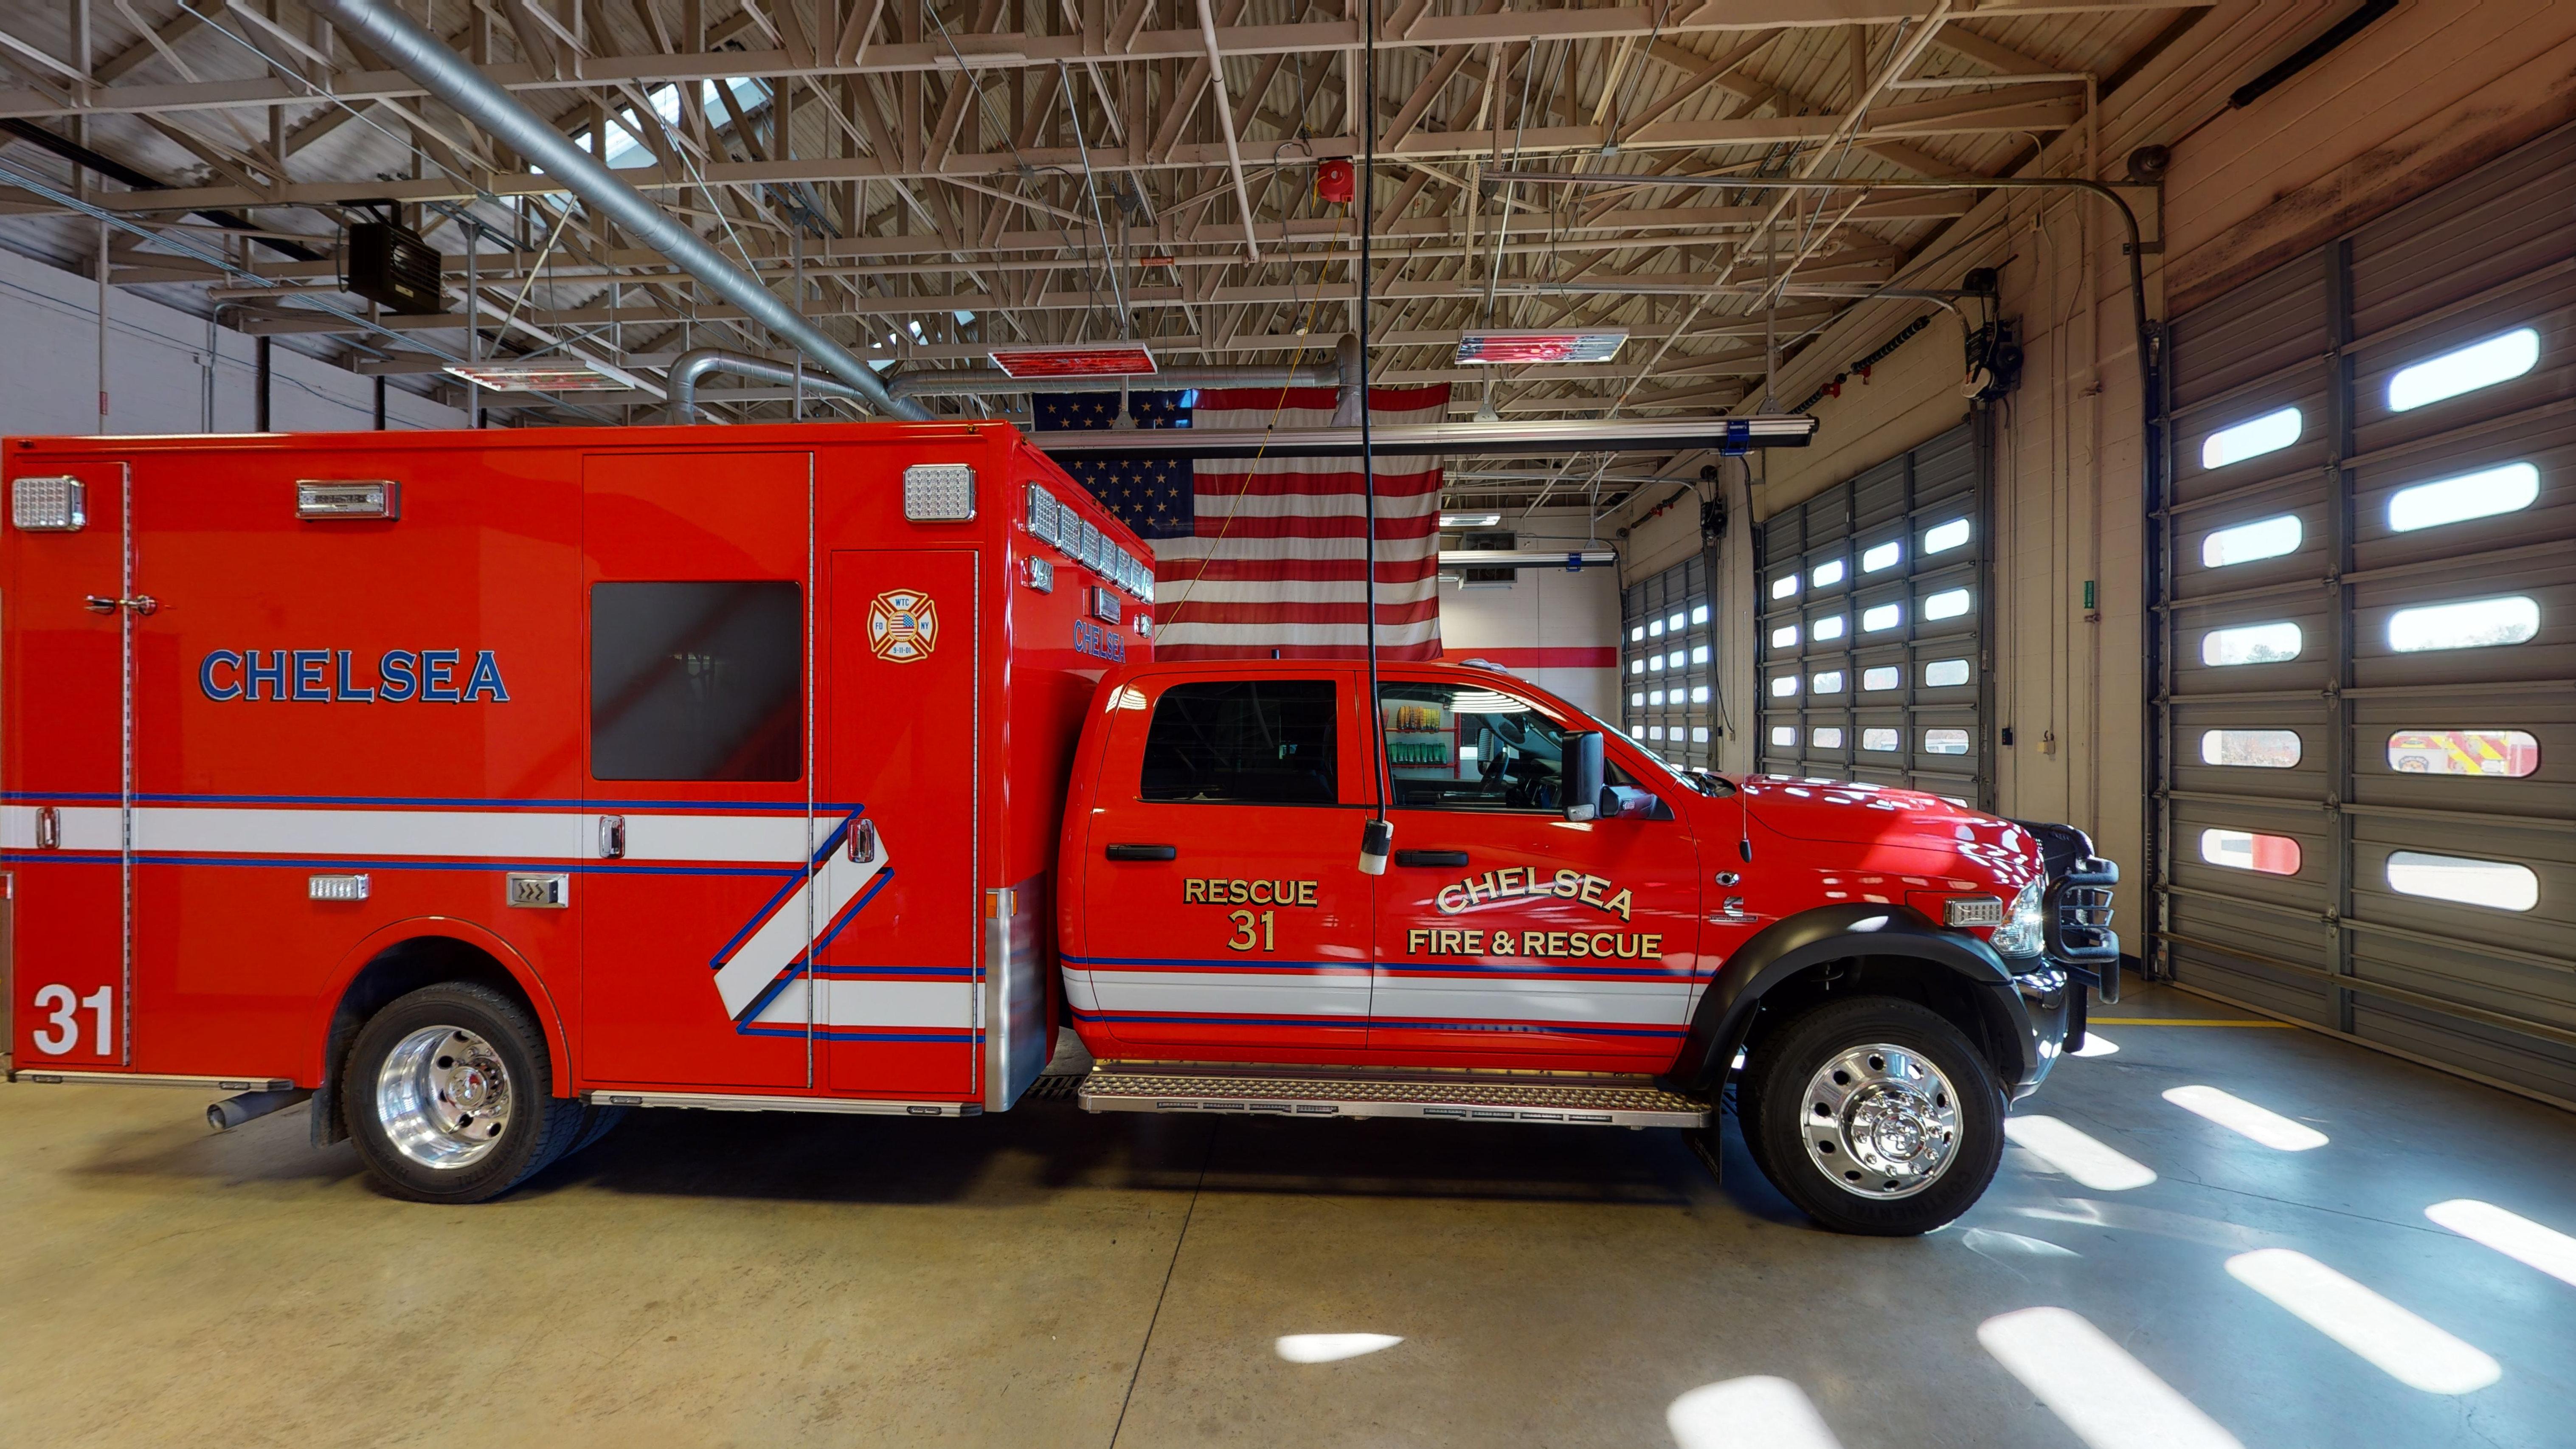 1_Chelsea-Fire-Rescue-Demers-151-06162021_101113